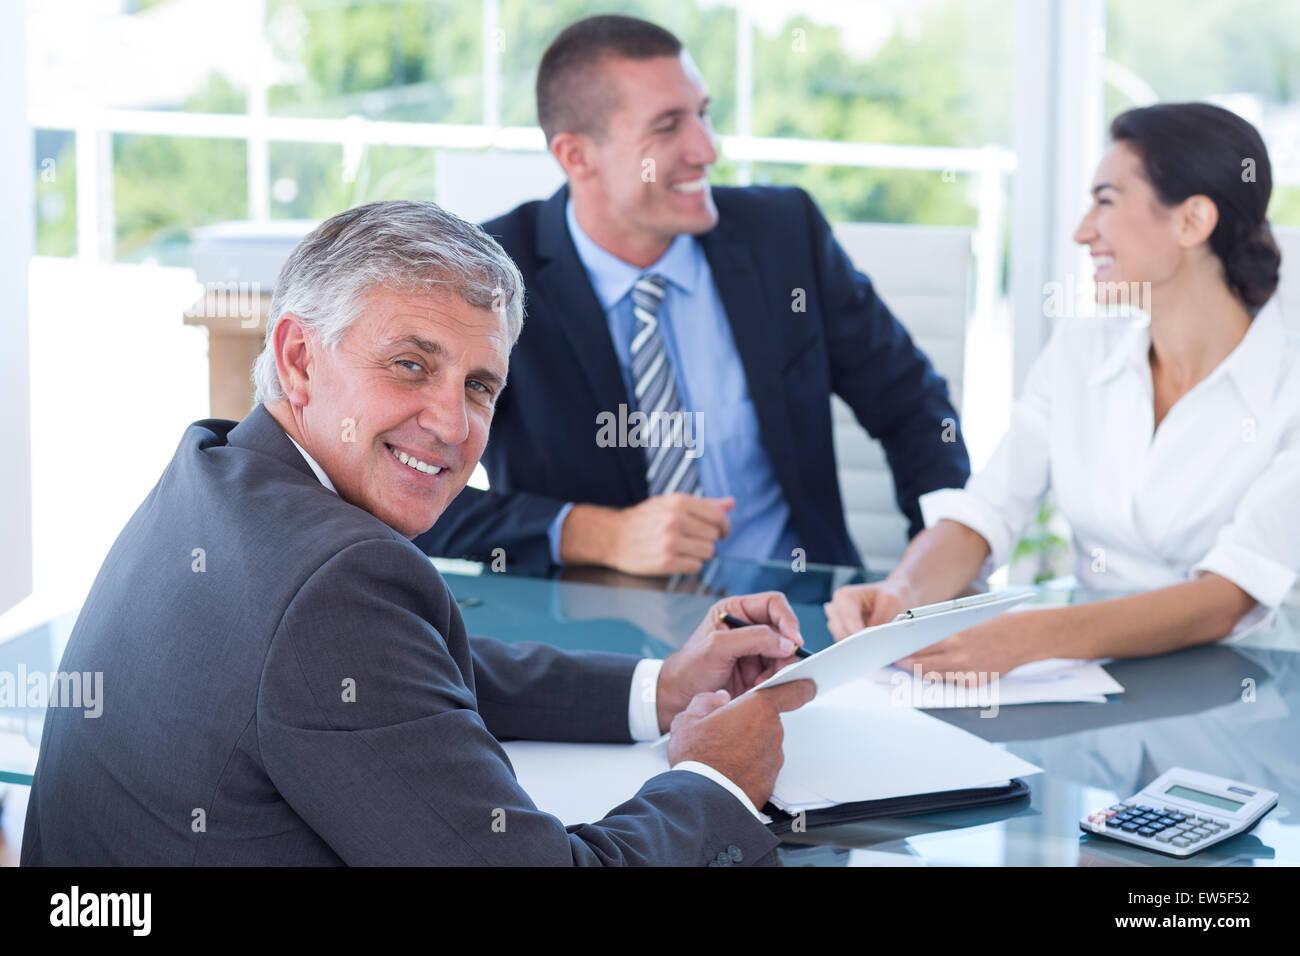 Smiling business people brainstorming ensemble Photo Stock